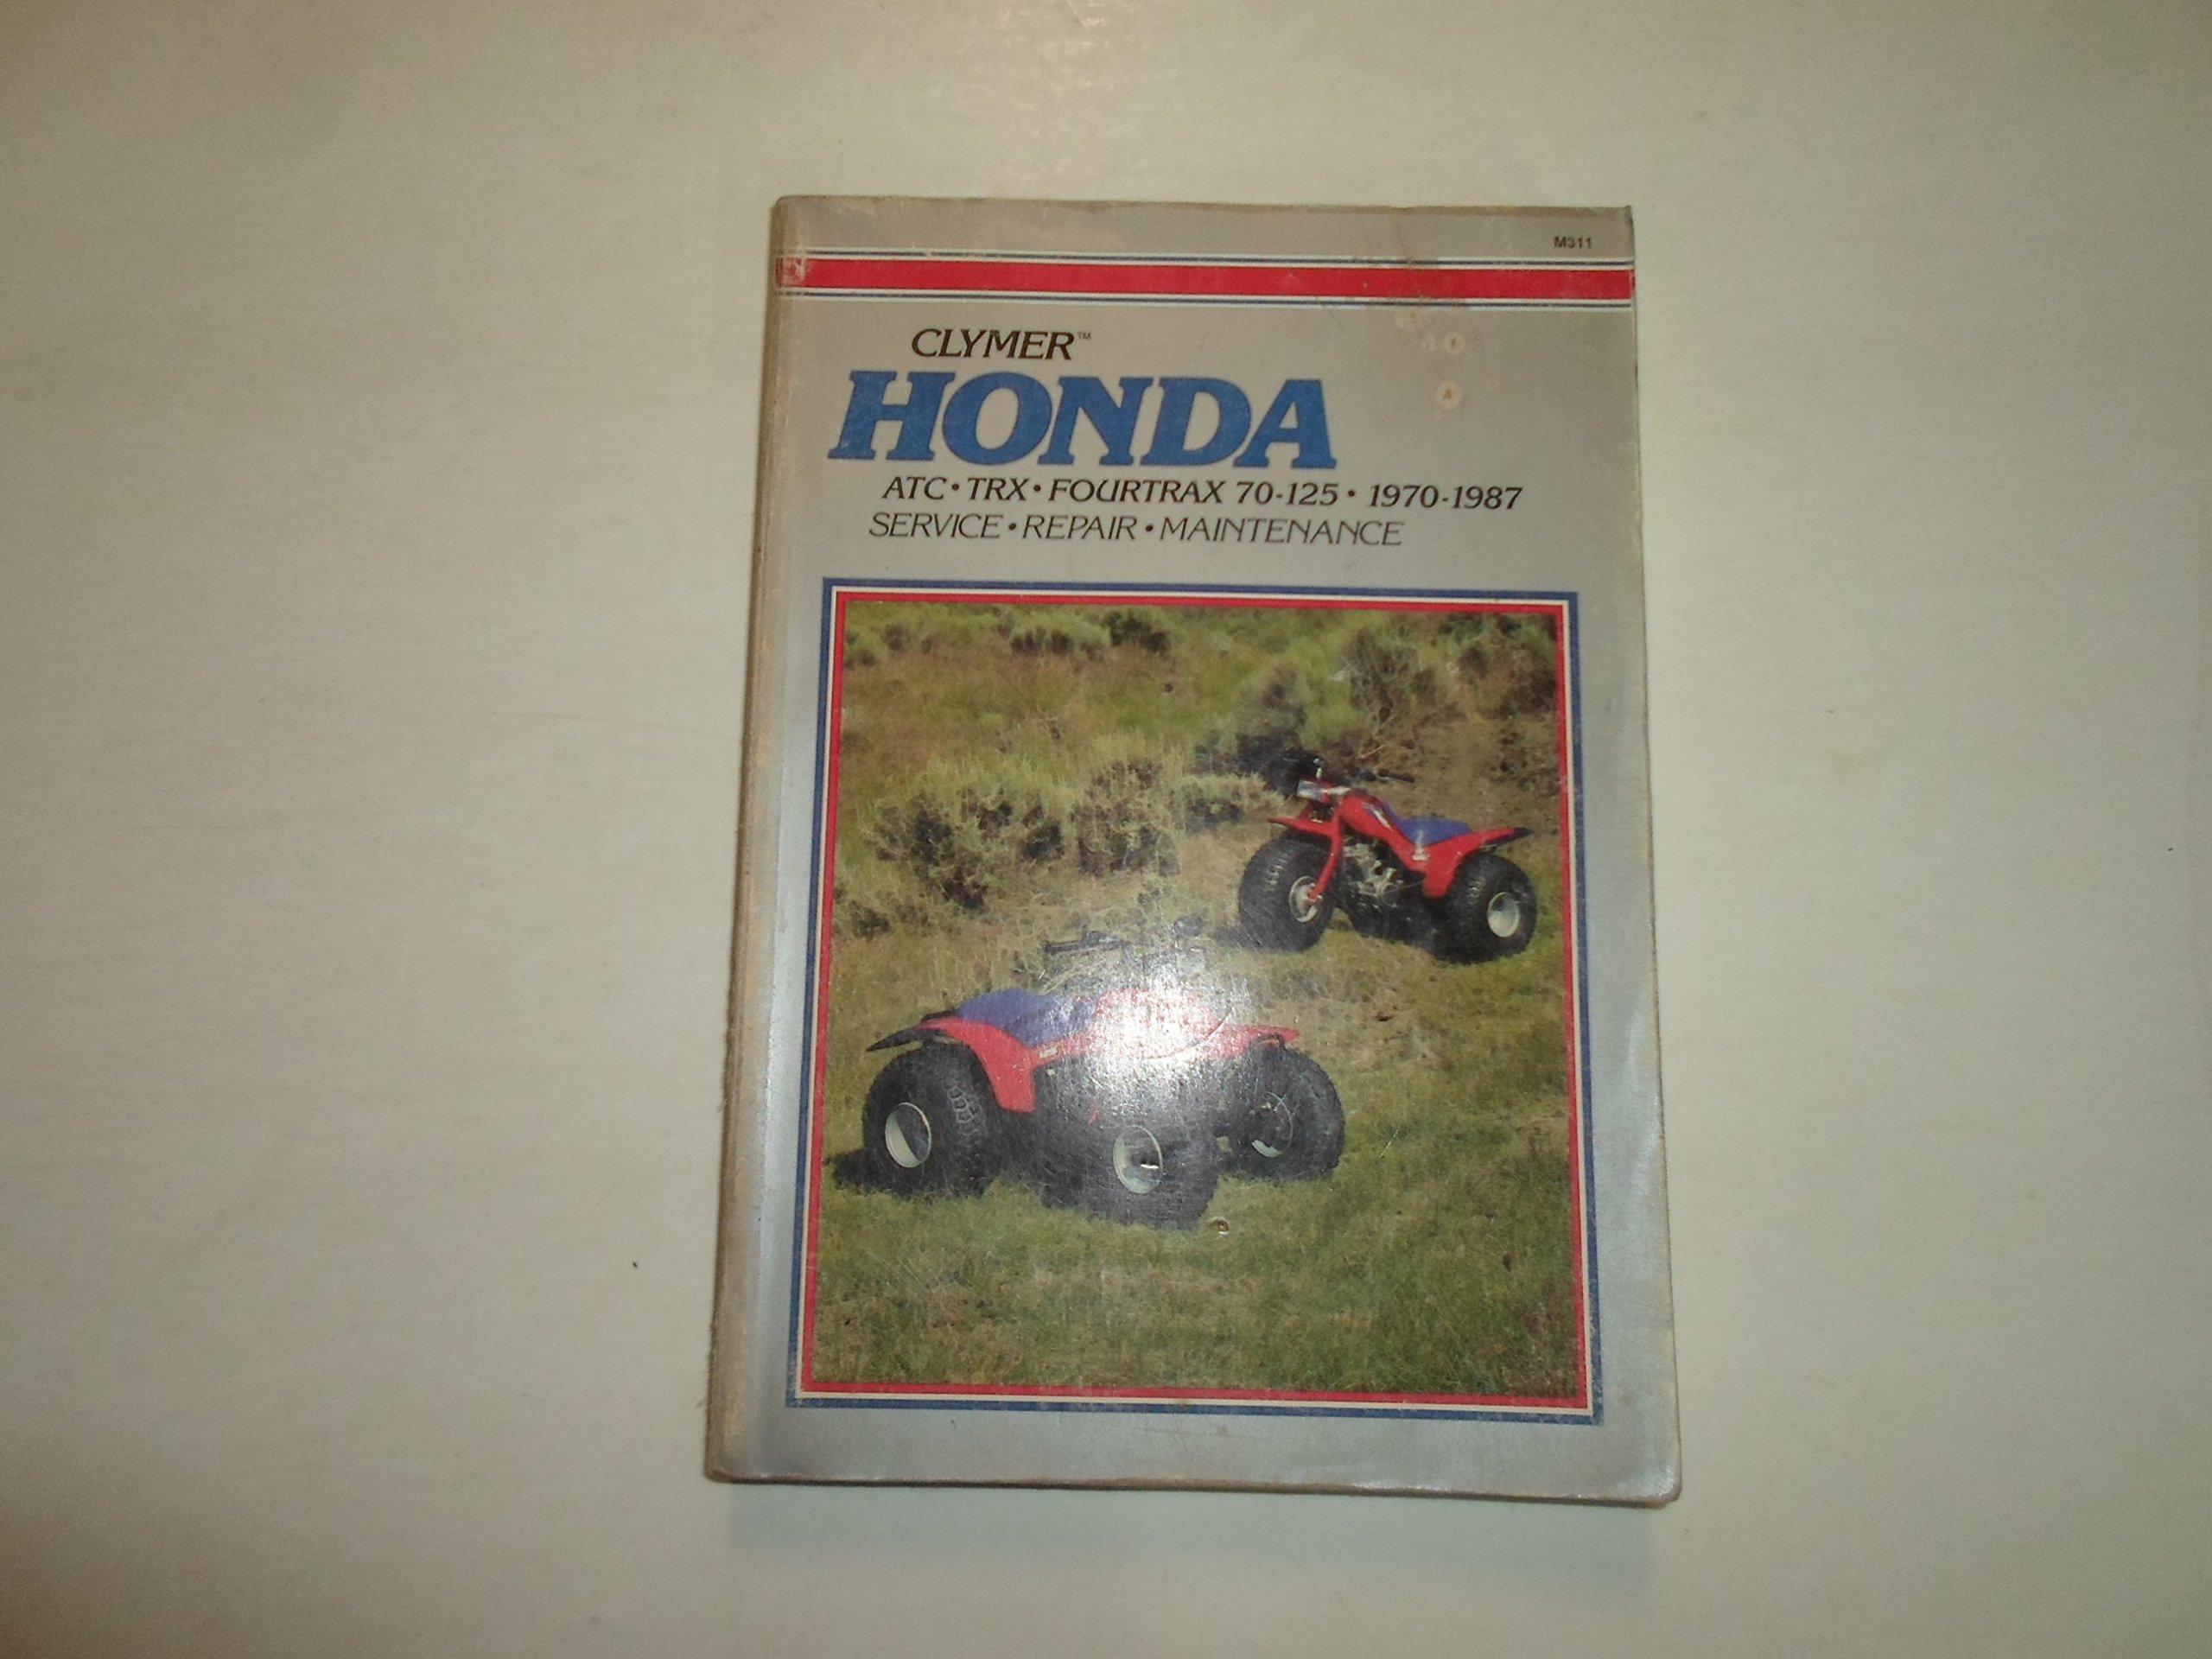 1970 1987 Clymer Honda Atc Trx Fourtrax 7 125 Service Repair Atlas Cd 70 Wiring Diagram Maintenance Manual Suzuki Automotive Literature Books